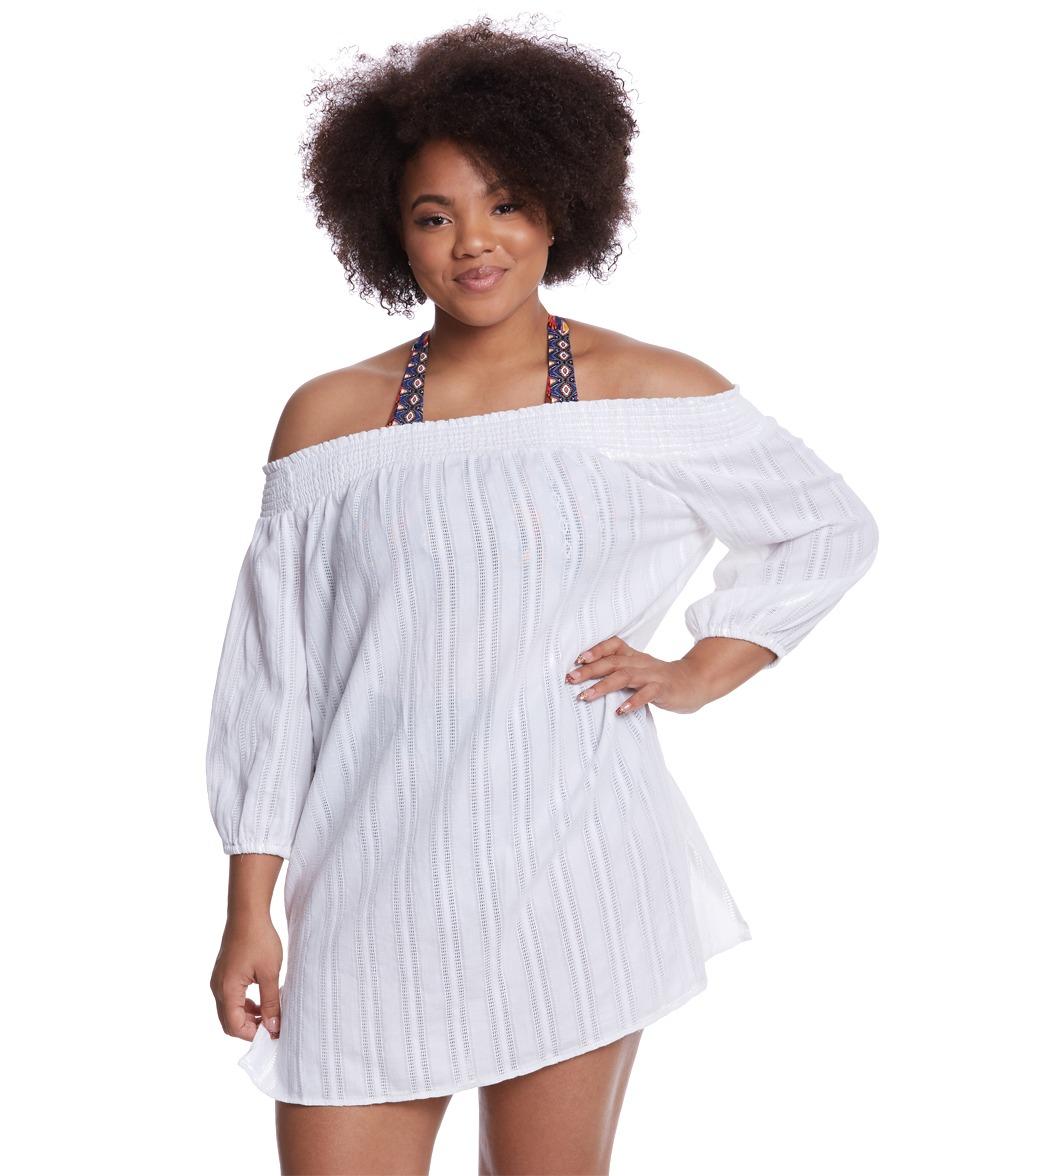 79419e7611 Lauren Ralph Lauren Plus Size Dobby Smock Tunic at SwimOutlet.com - Free  Shipping